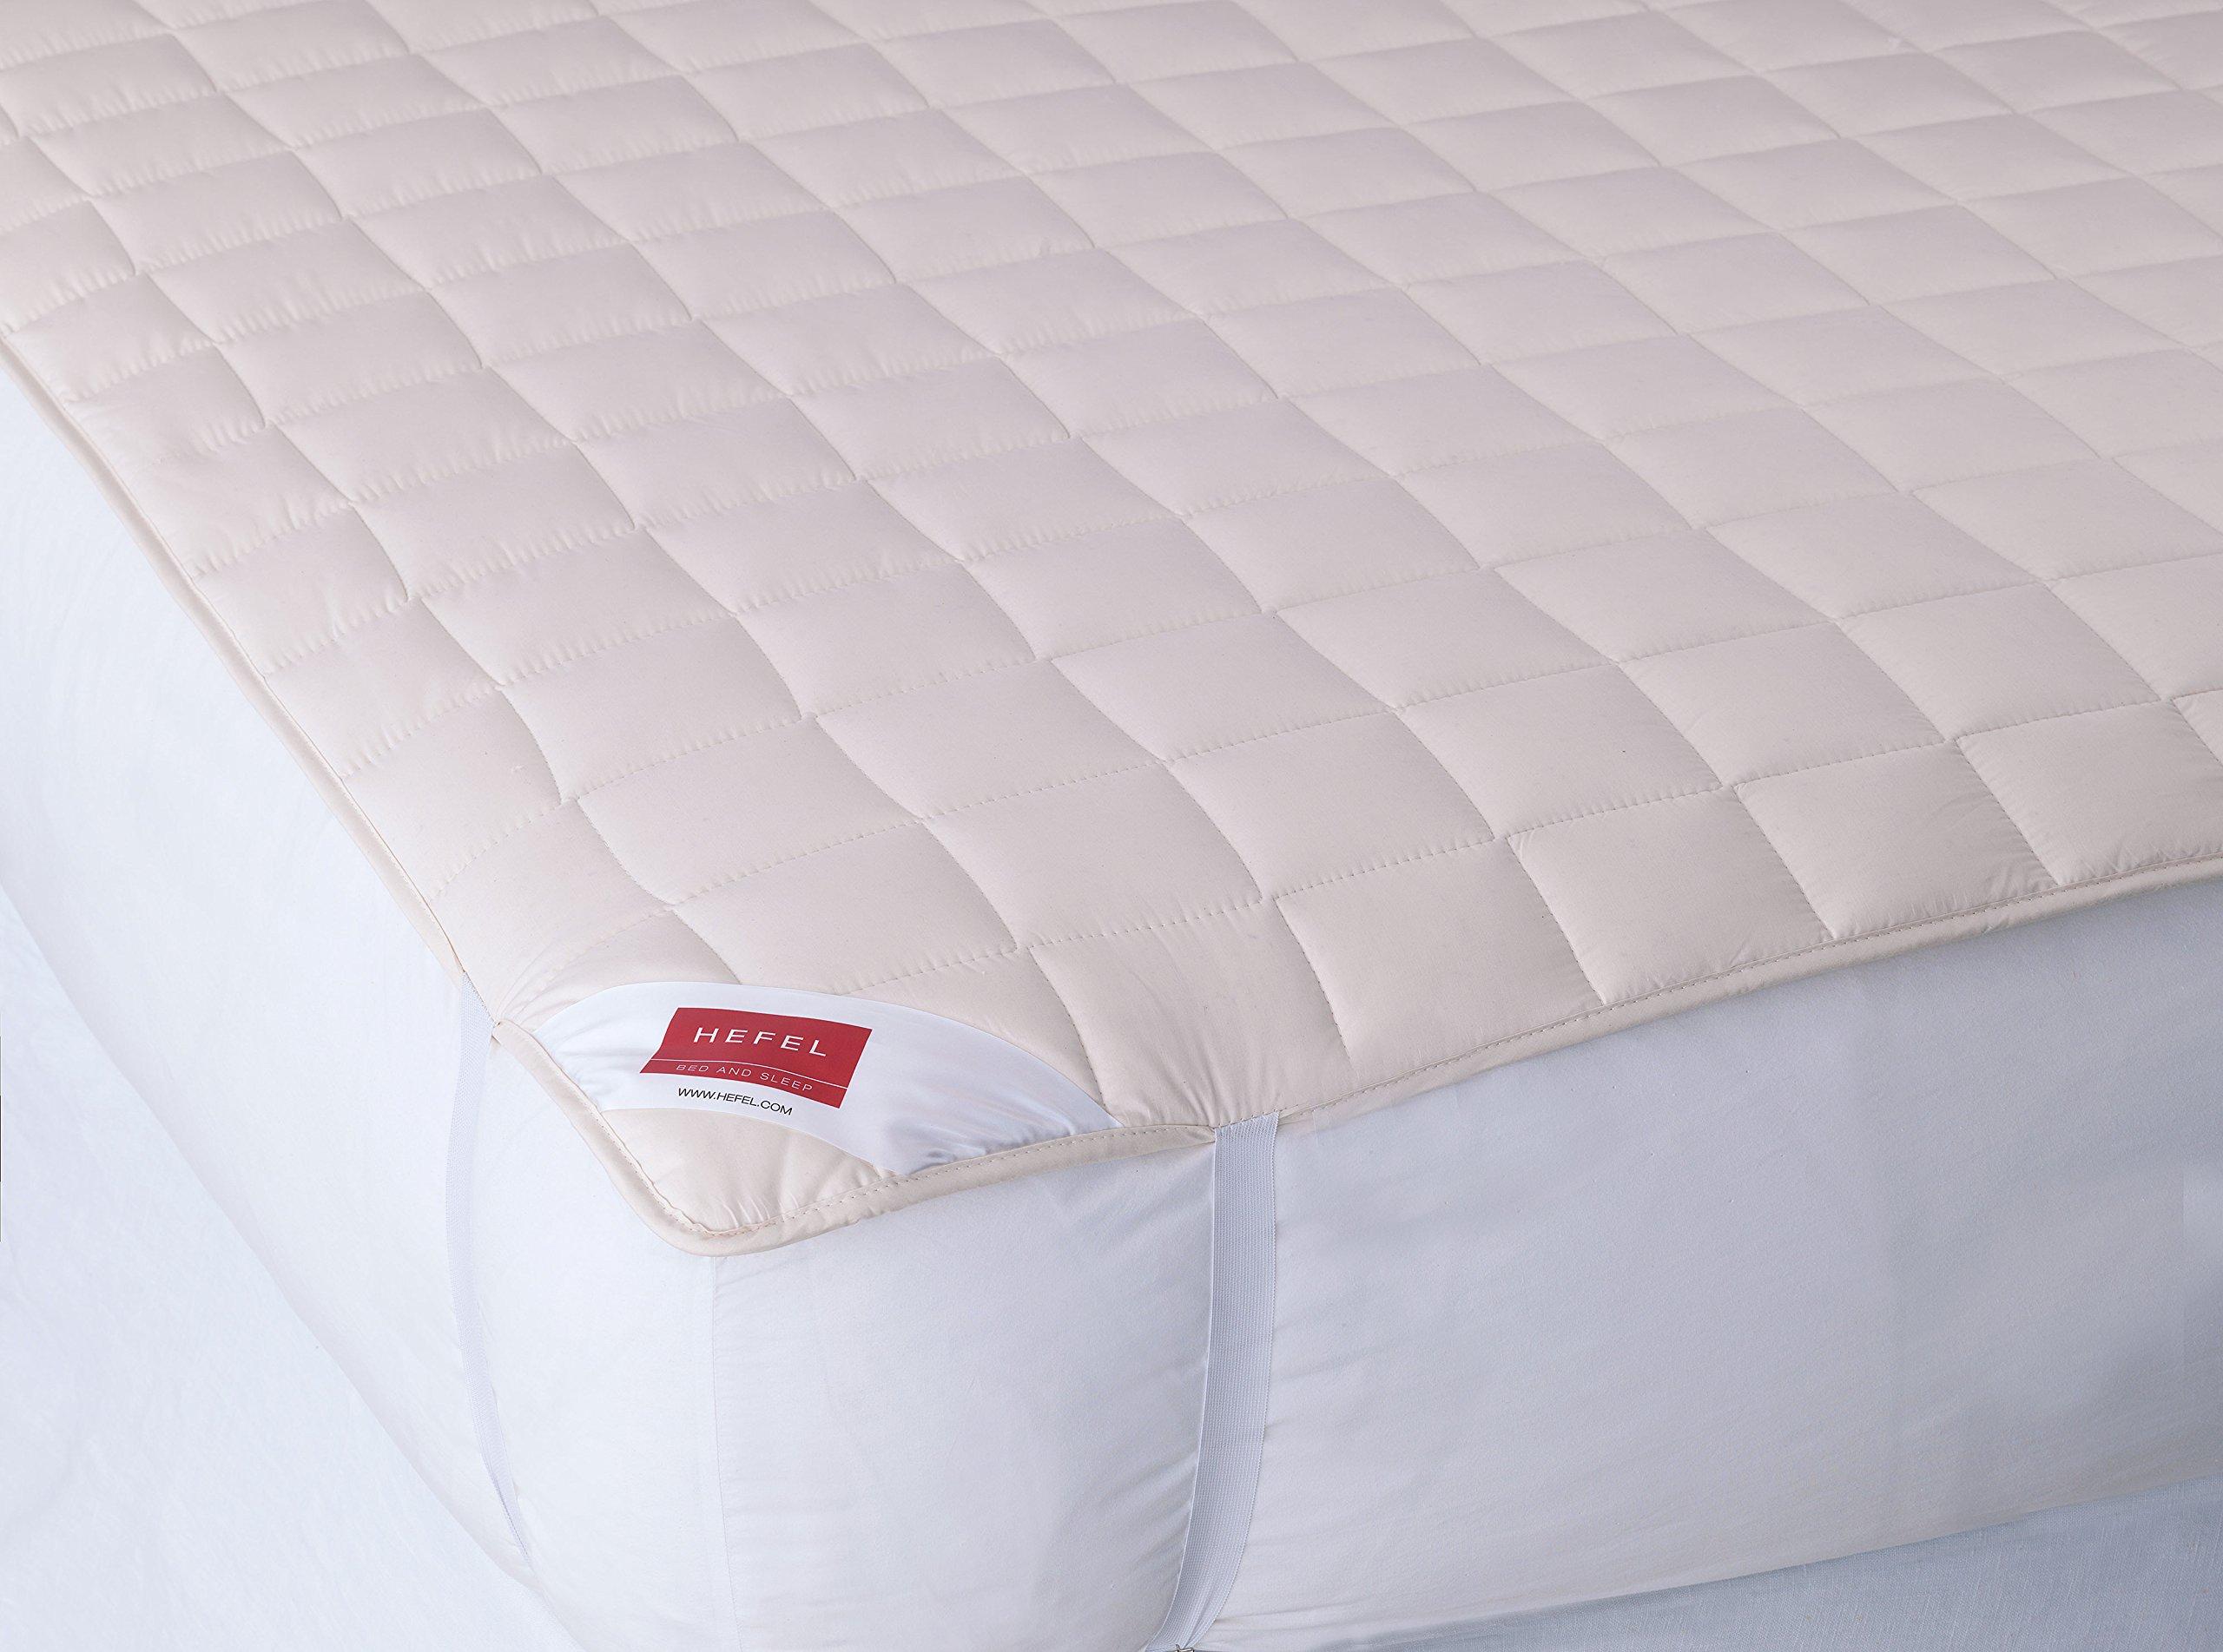 Hefel 2410U Cotton Organic Mattress Pad, California King